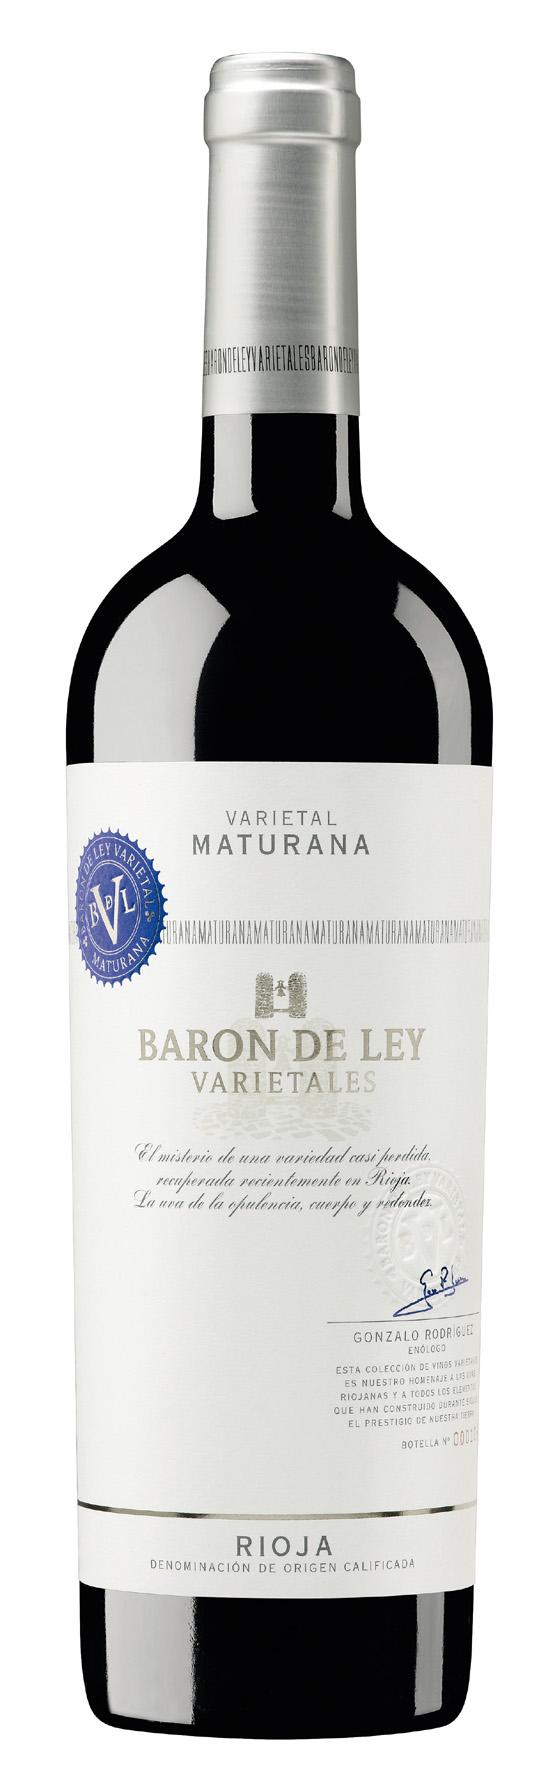 2014 Varietal Maturana BARON DE LEY DOCa Rioja